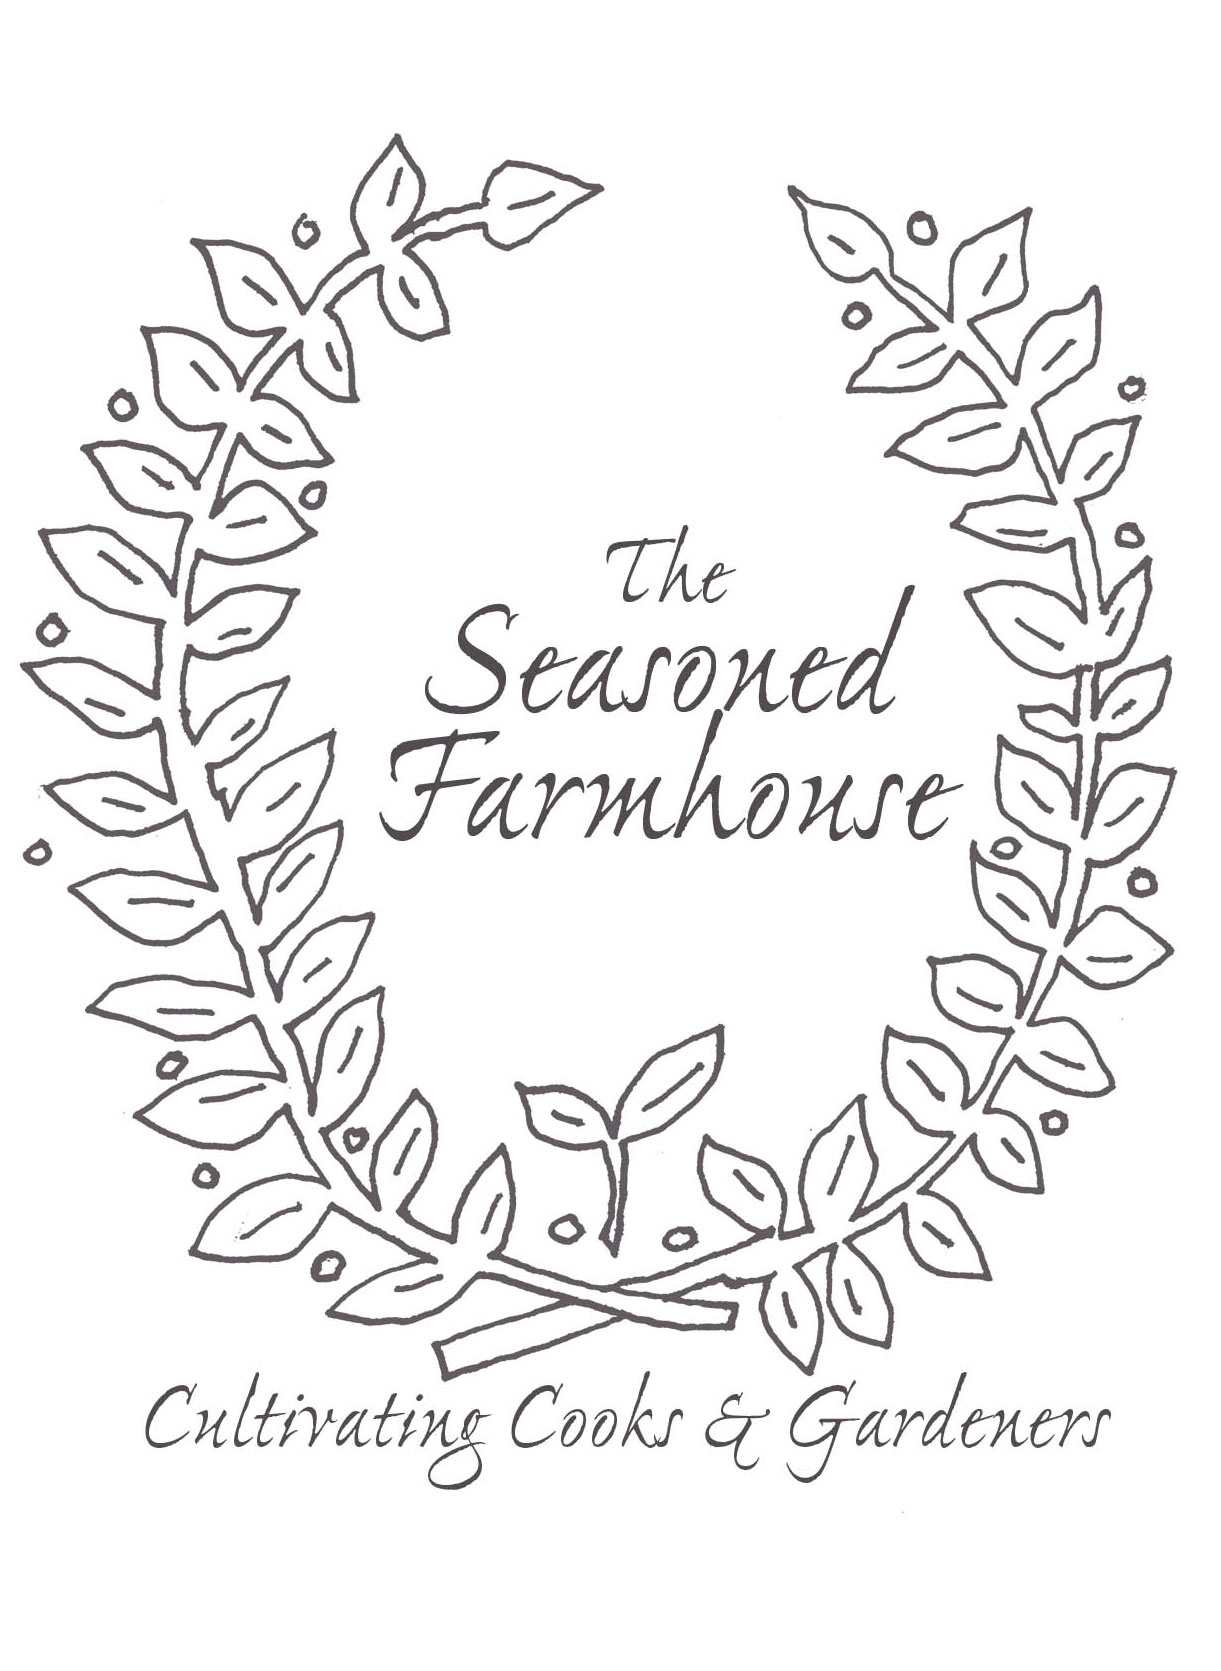 The Seasoned Farmhouse